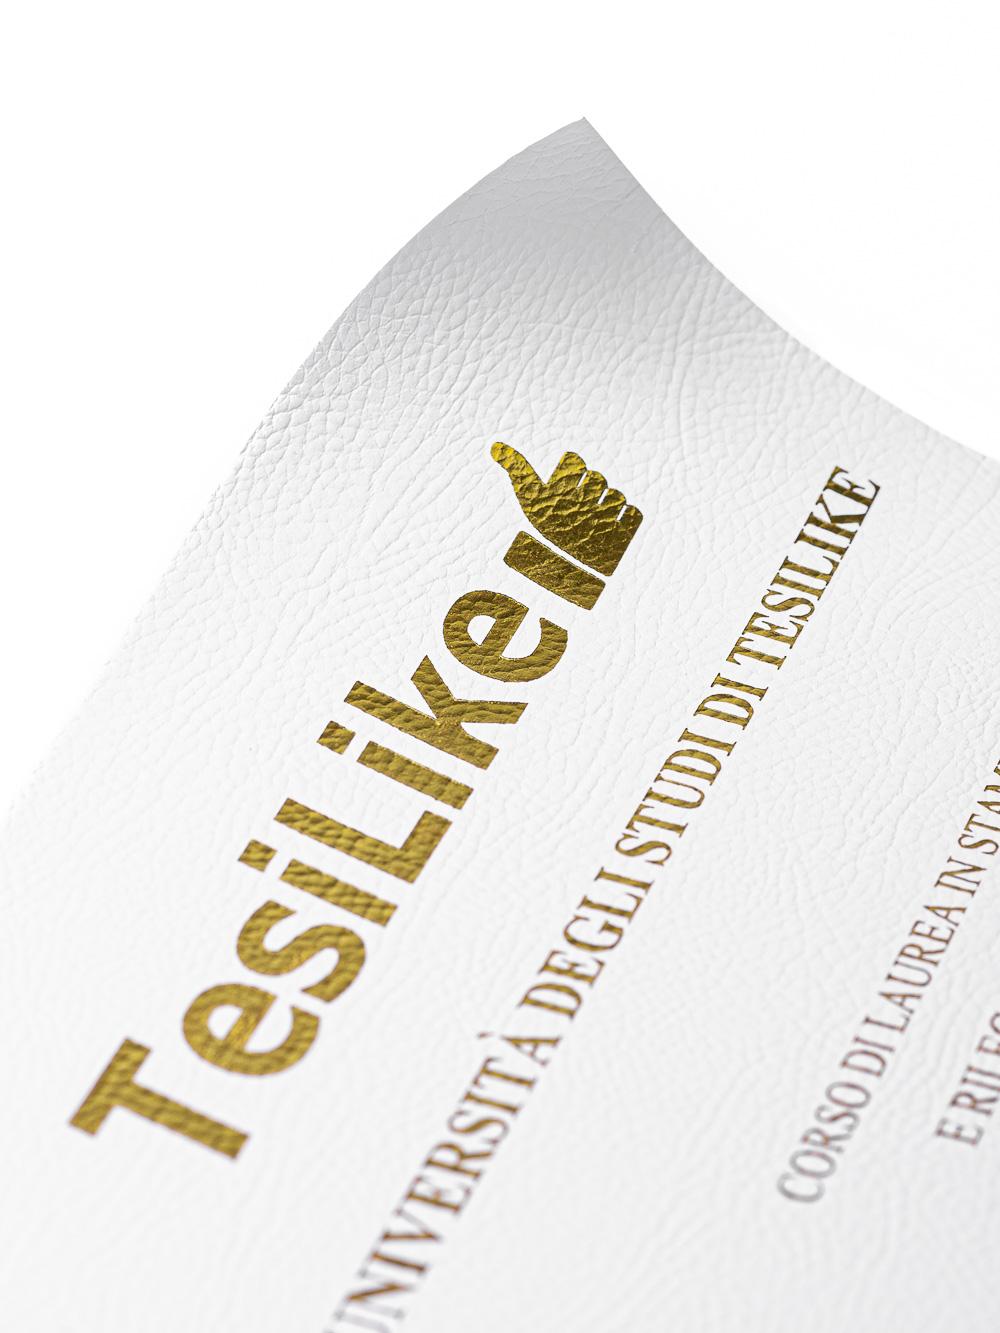 copertina-tesi-flessibile-morbida-bianca-frontespizio-oro-dettaglio2-tesilike